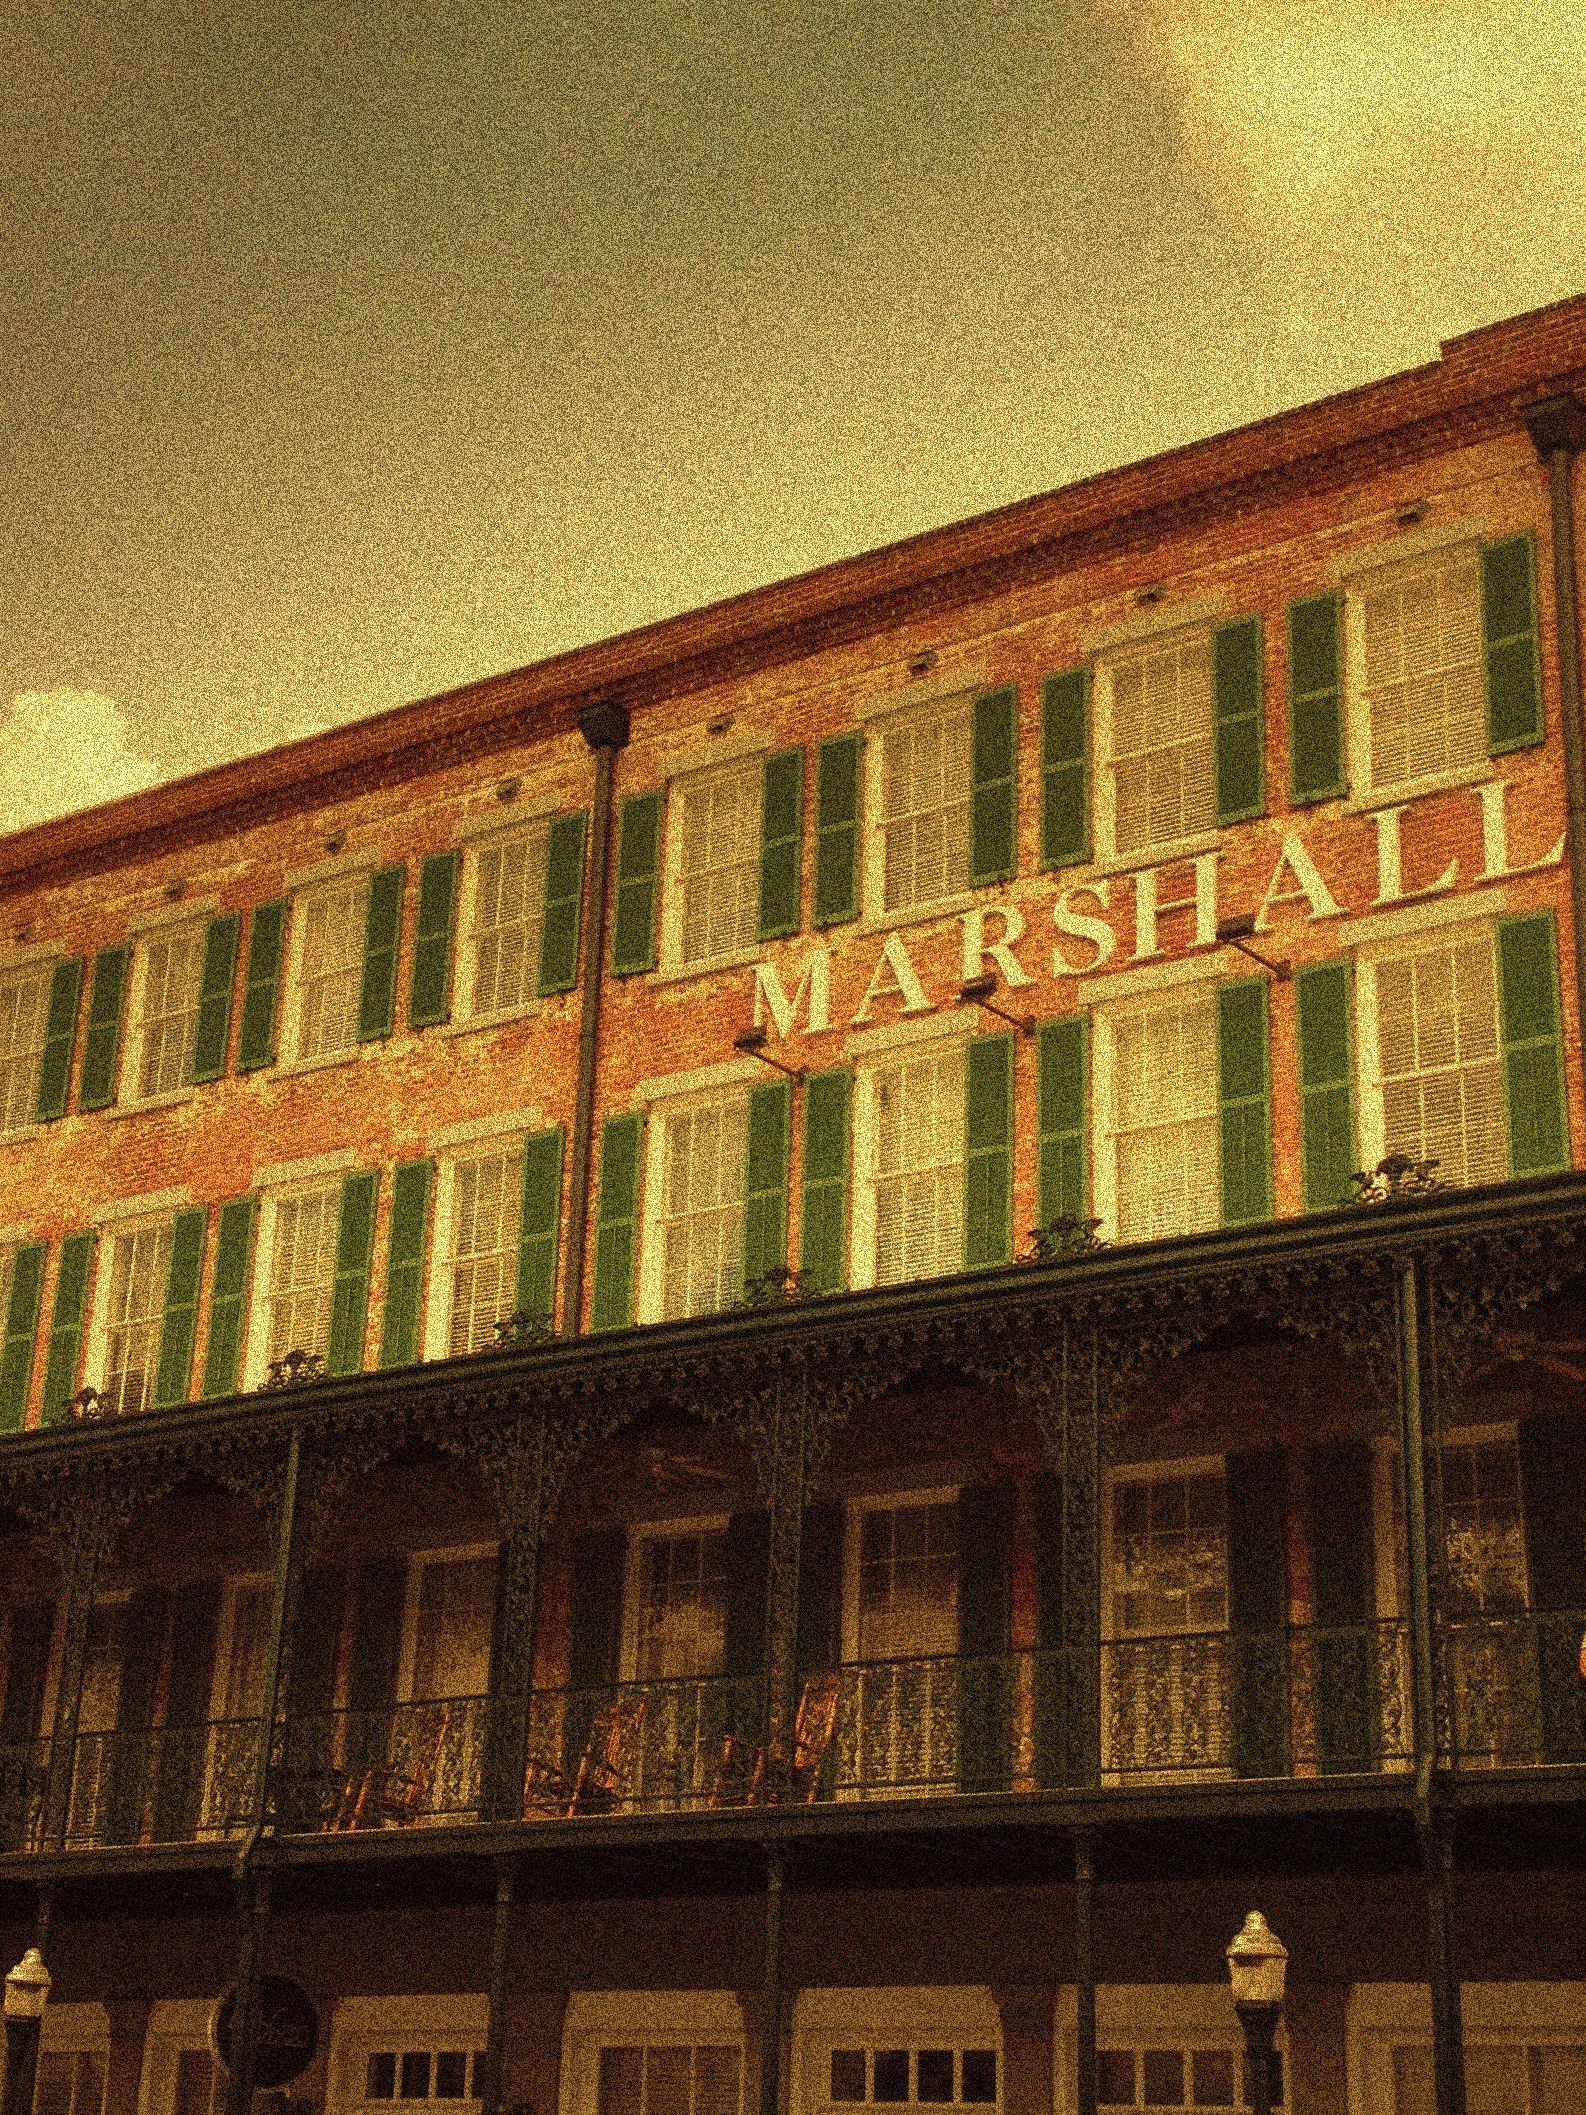 Haunted Hotel In Savannah Marshall House